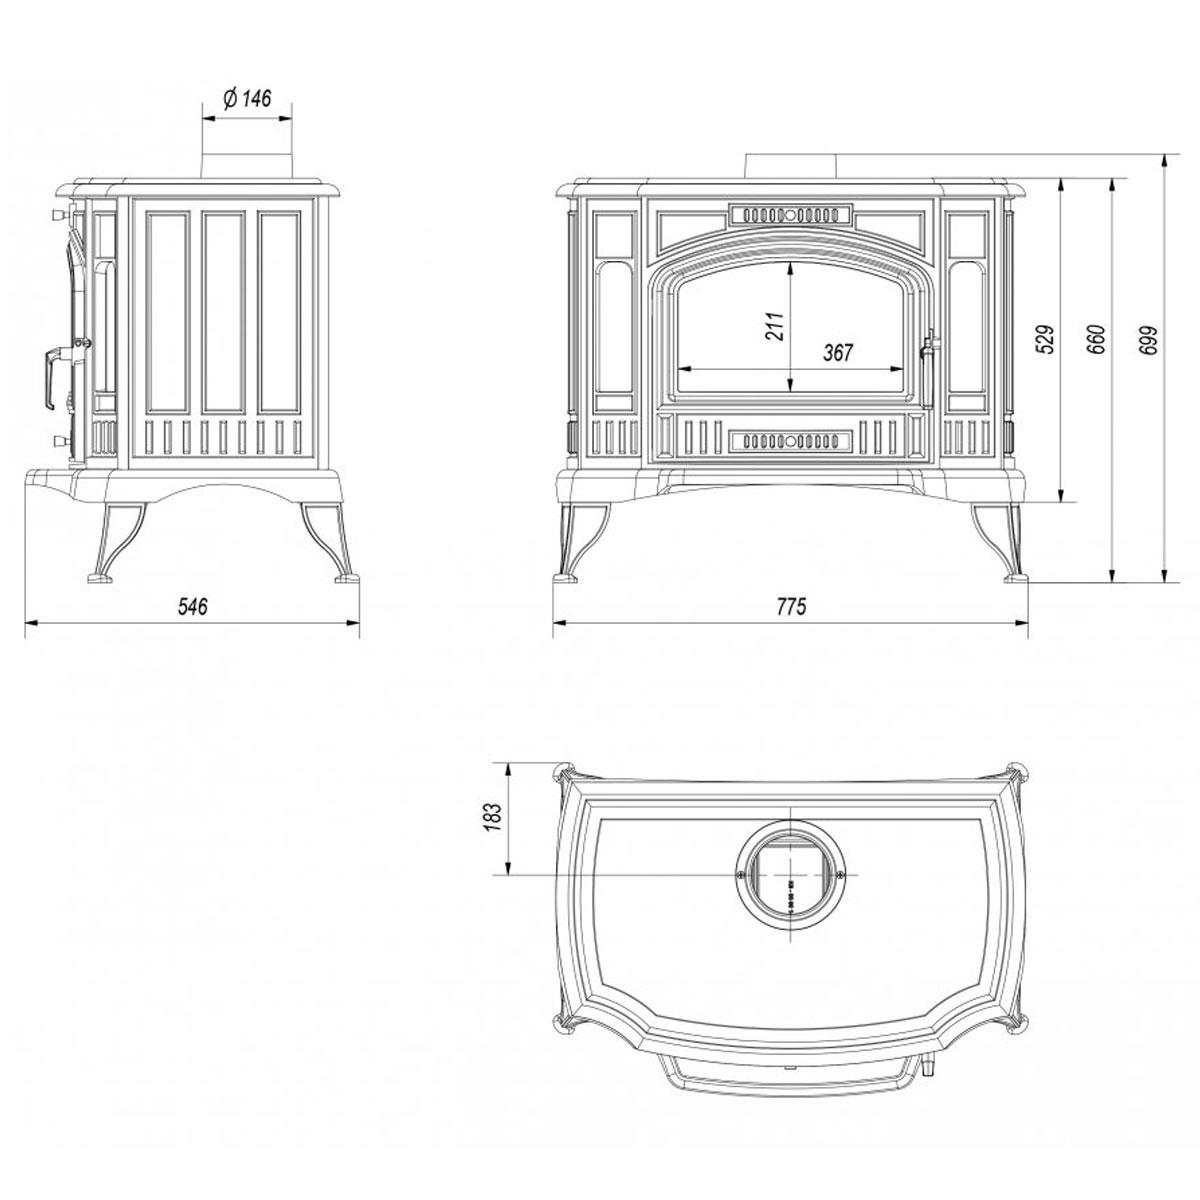 Kratki Poland Wood Stove Water Heater Koza K9 150 Pw W